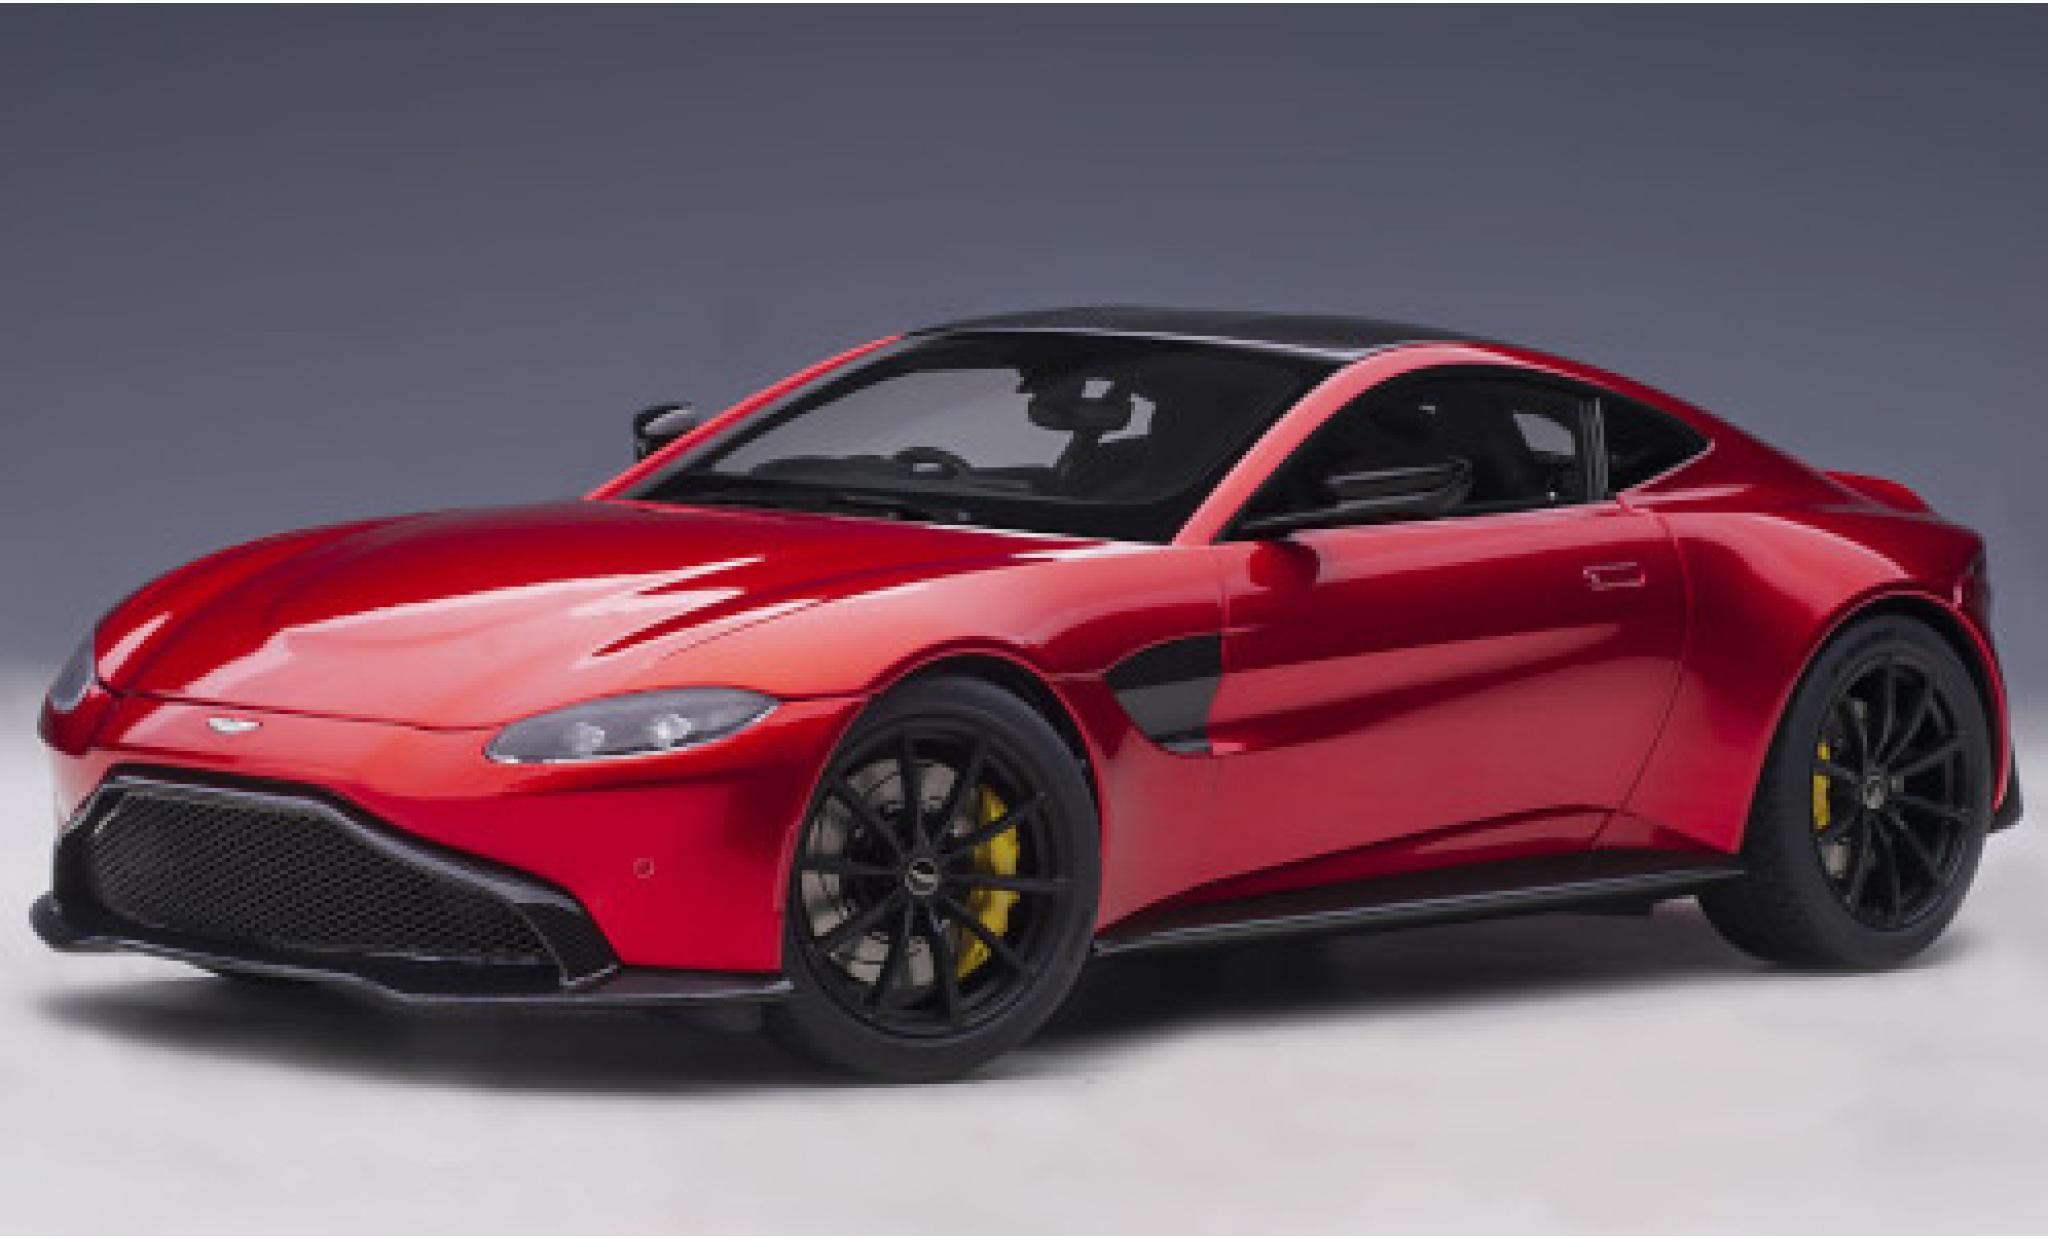 Aston Martin Vantage 1/18 AUTOart red/carbon RHD 2019